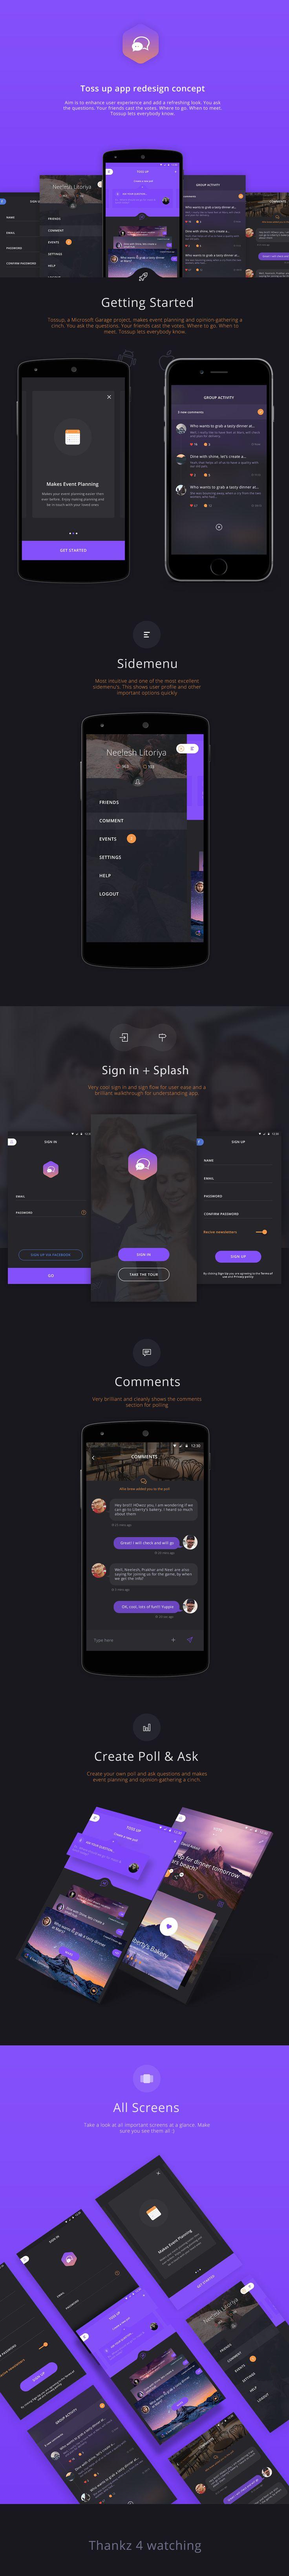 TOSS up app (redesign) on Behance